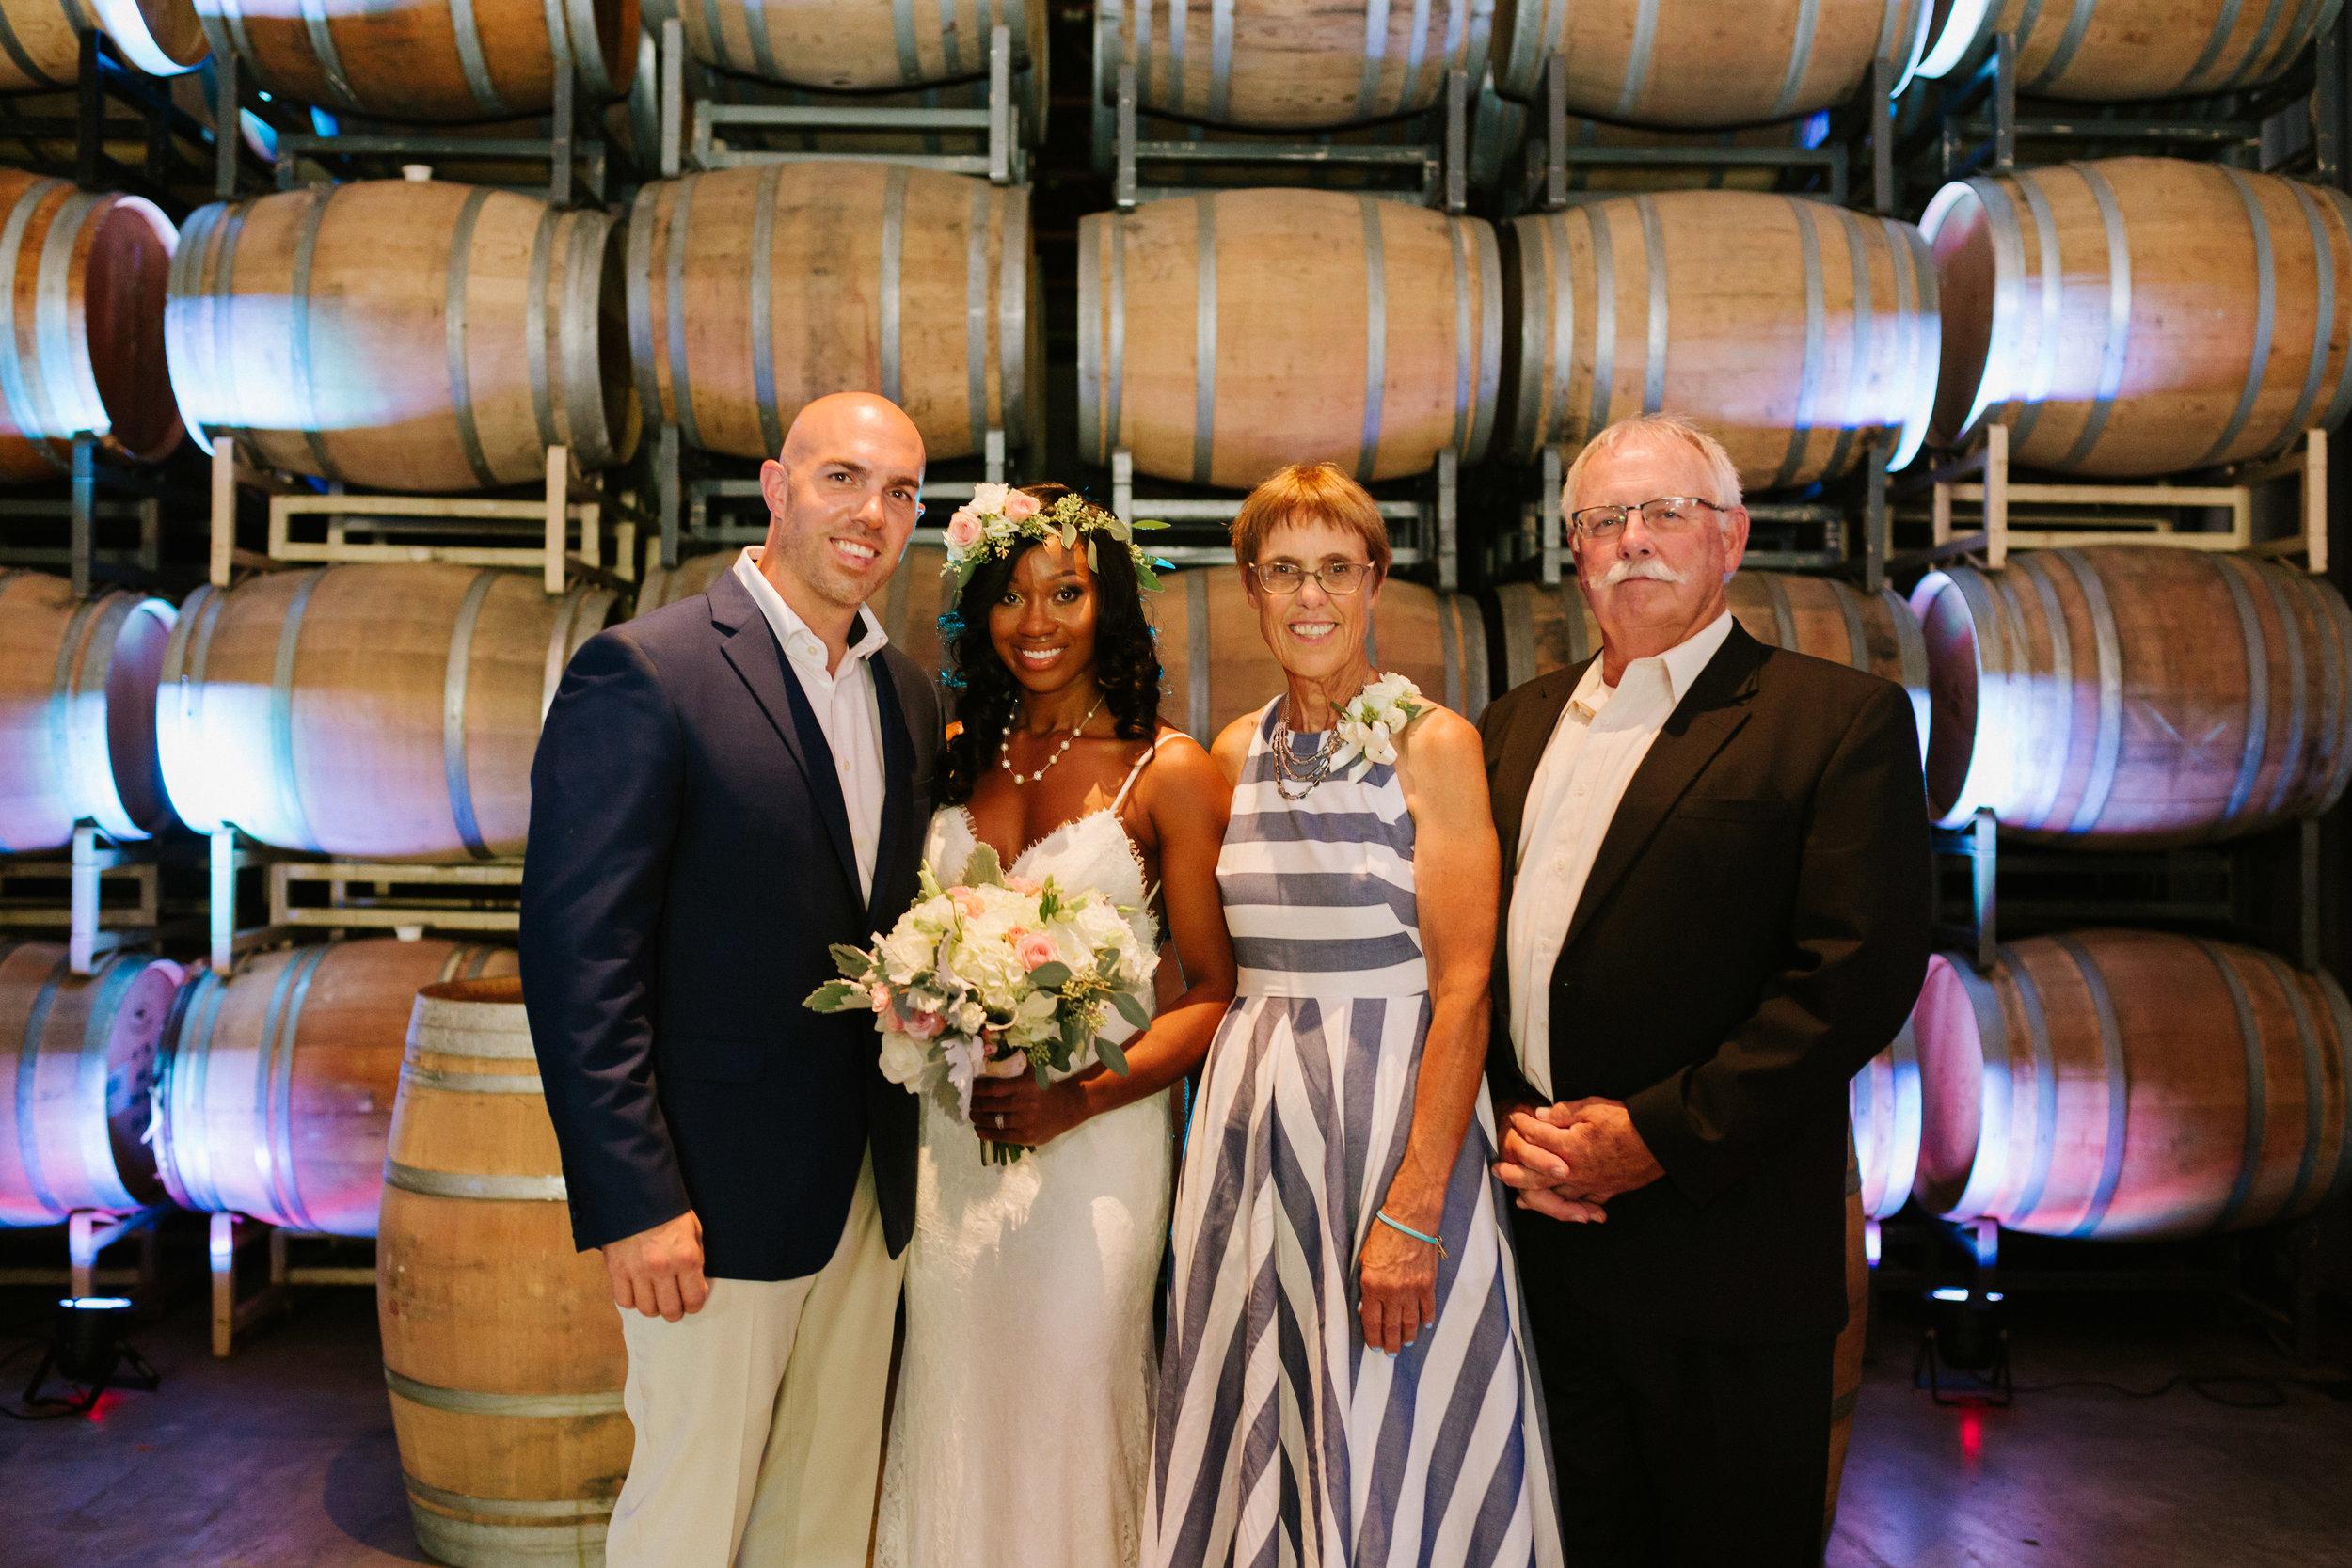 2017.09.16 Ashley and Chuck O'Day Quantam Leap Winery Wedding (197 of 462).jpg